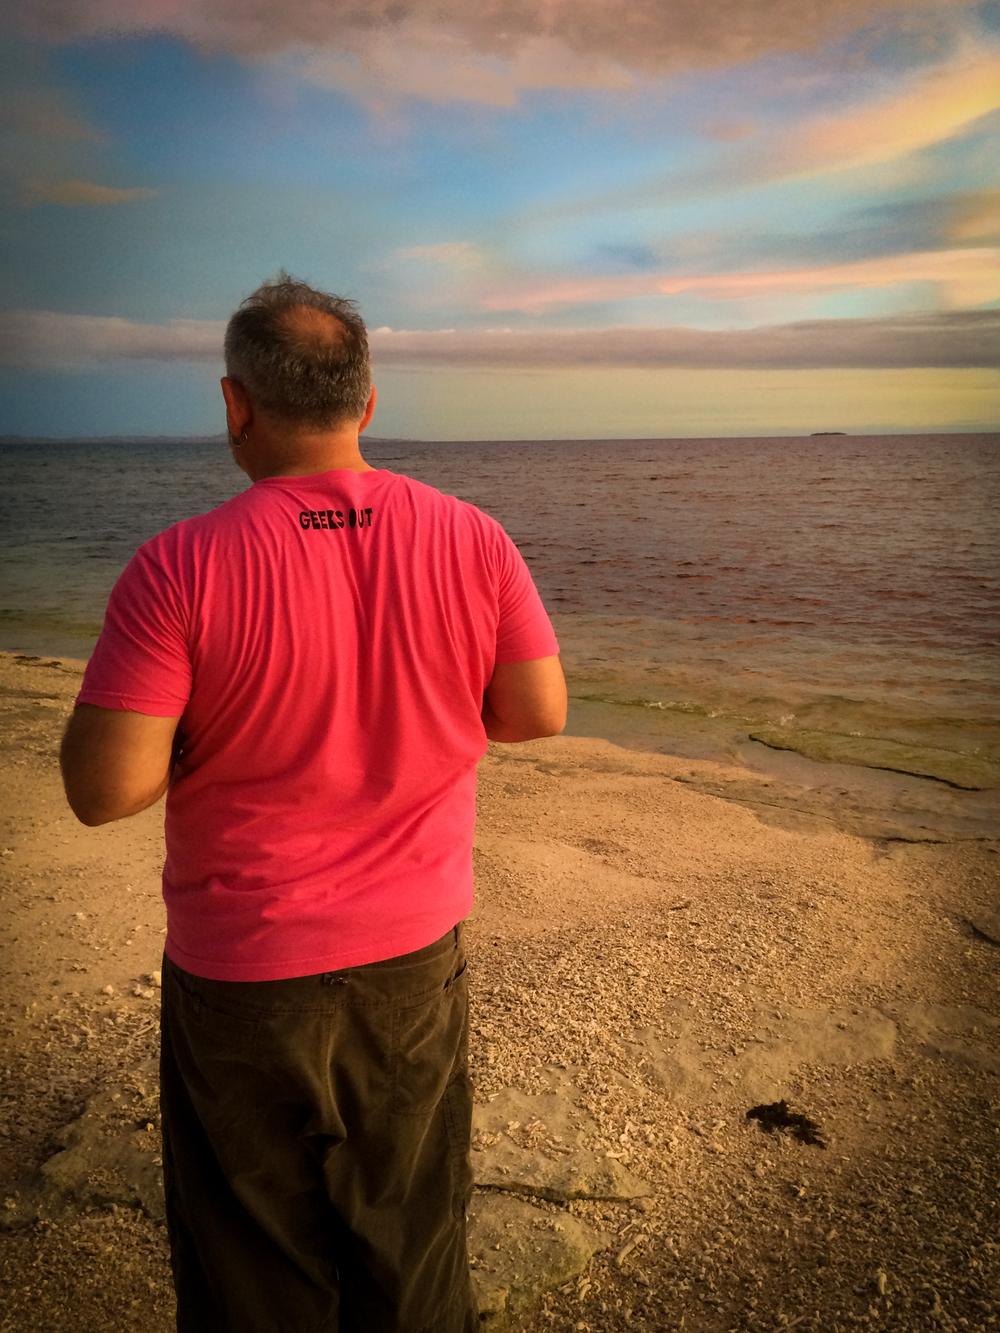 boutny beach papa's back-1.jpg